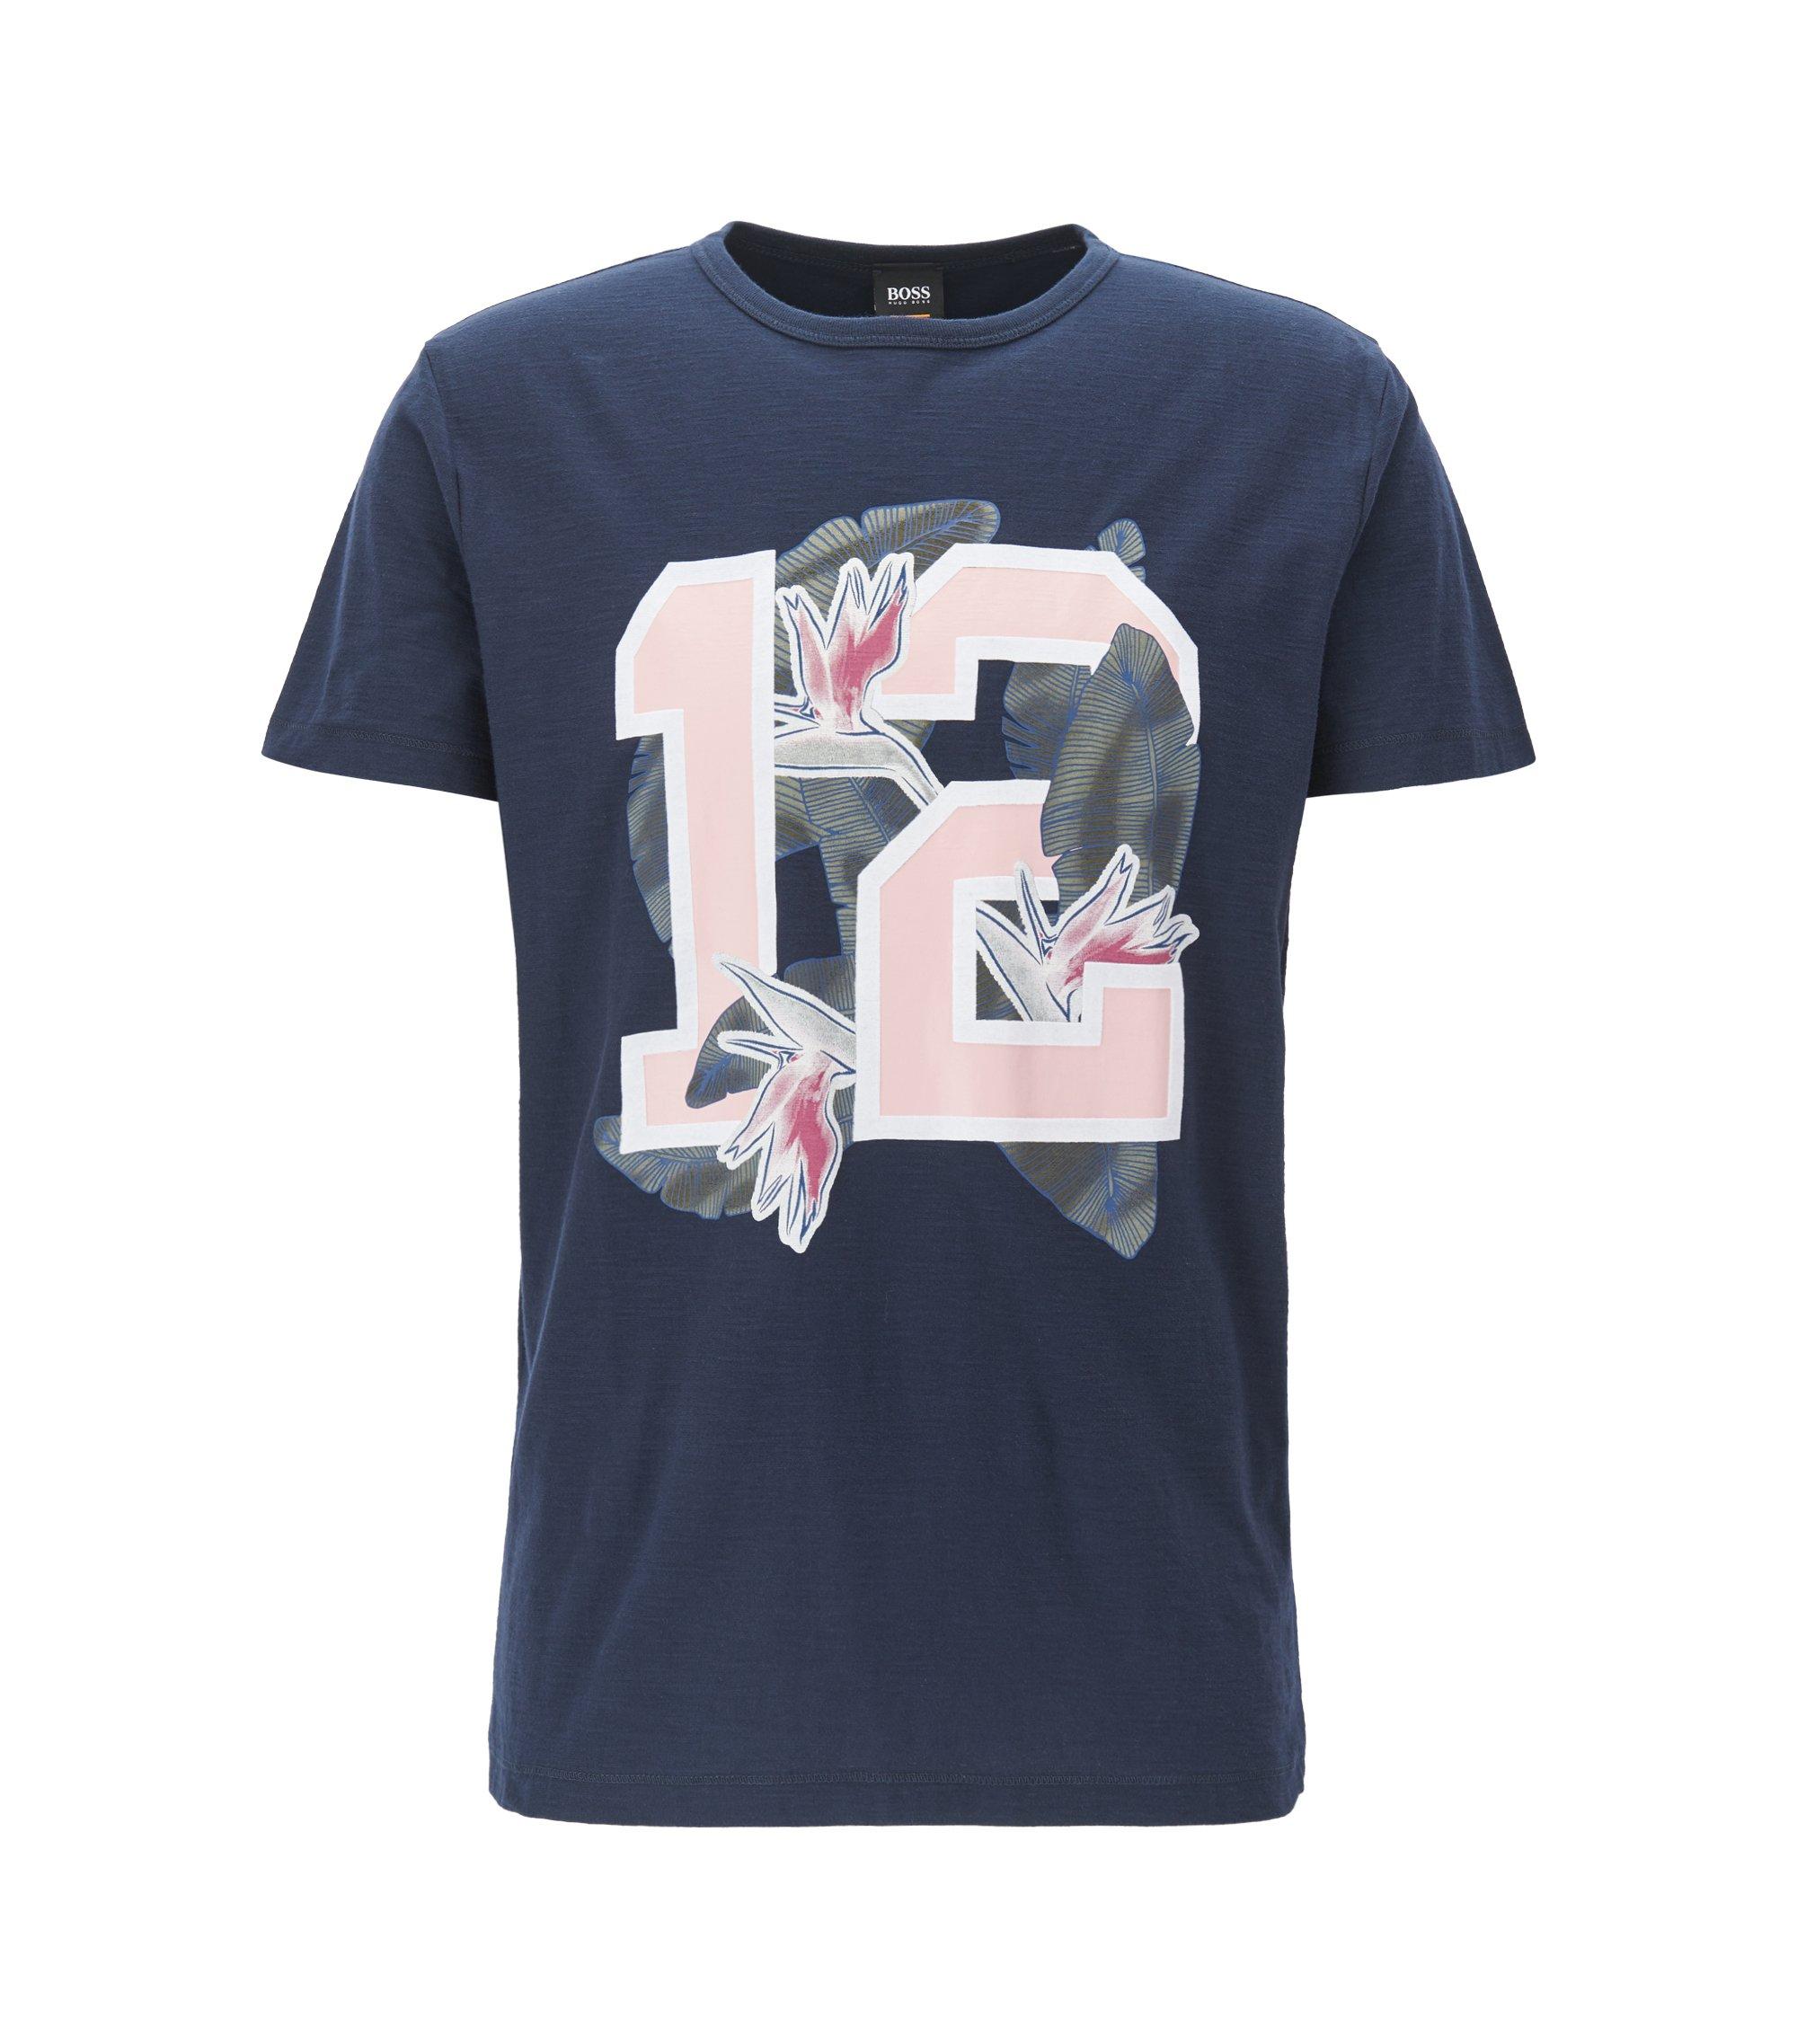 Relaxed-Fit T-Shirt aus Baumwoll-Jersey mit Grafik-Print, Dunkelblau